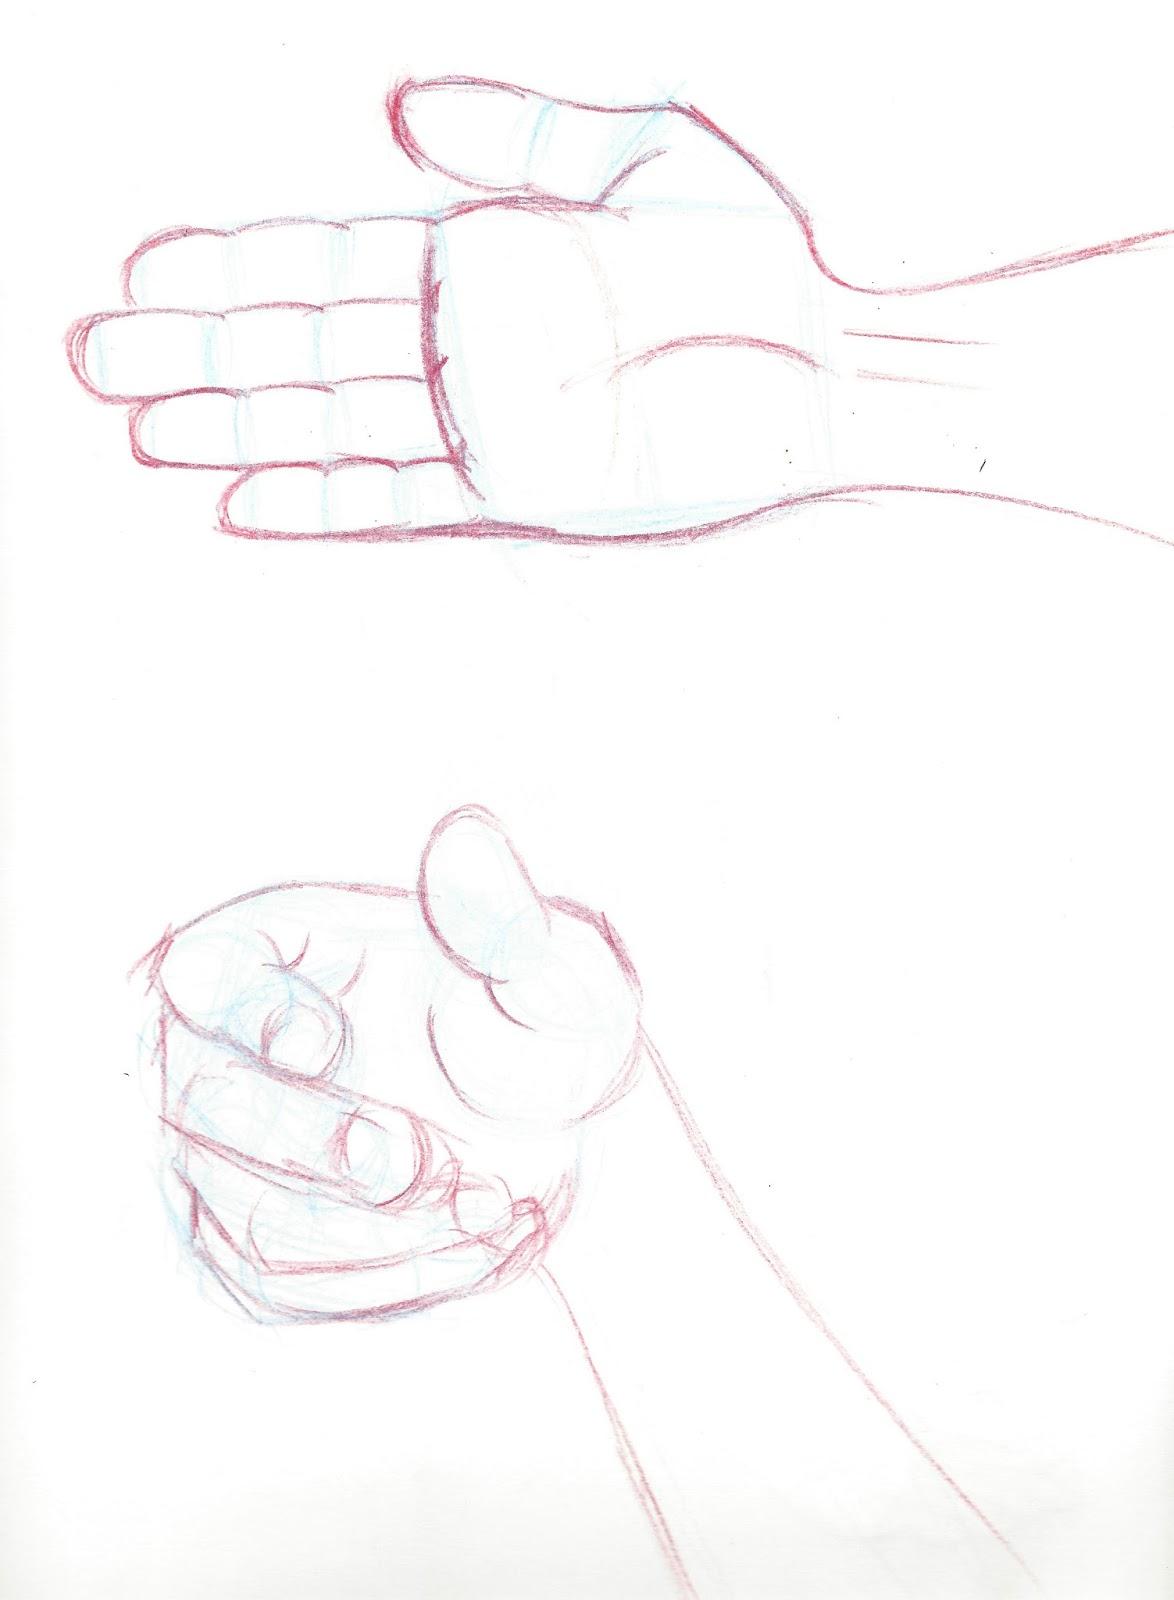 hands-sketches-iamo.jpg